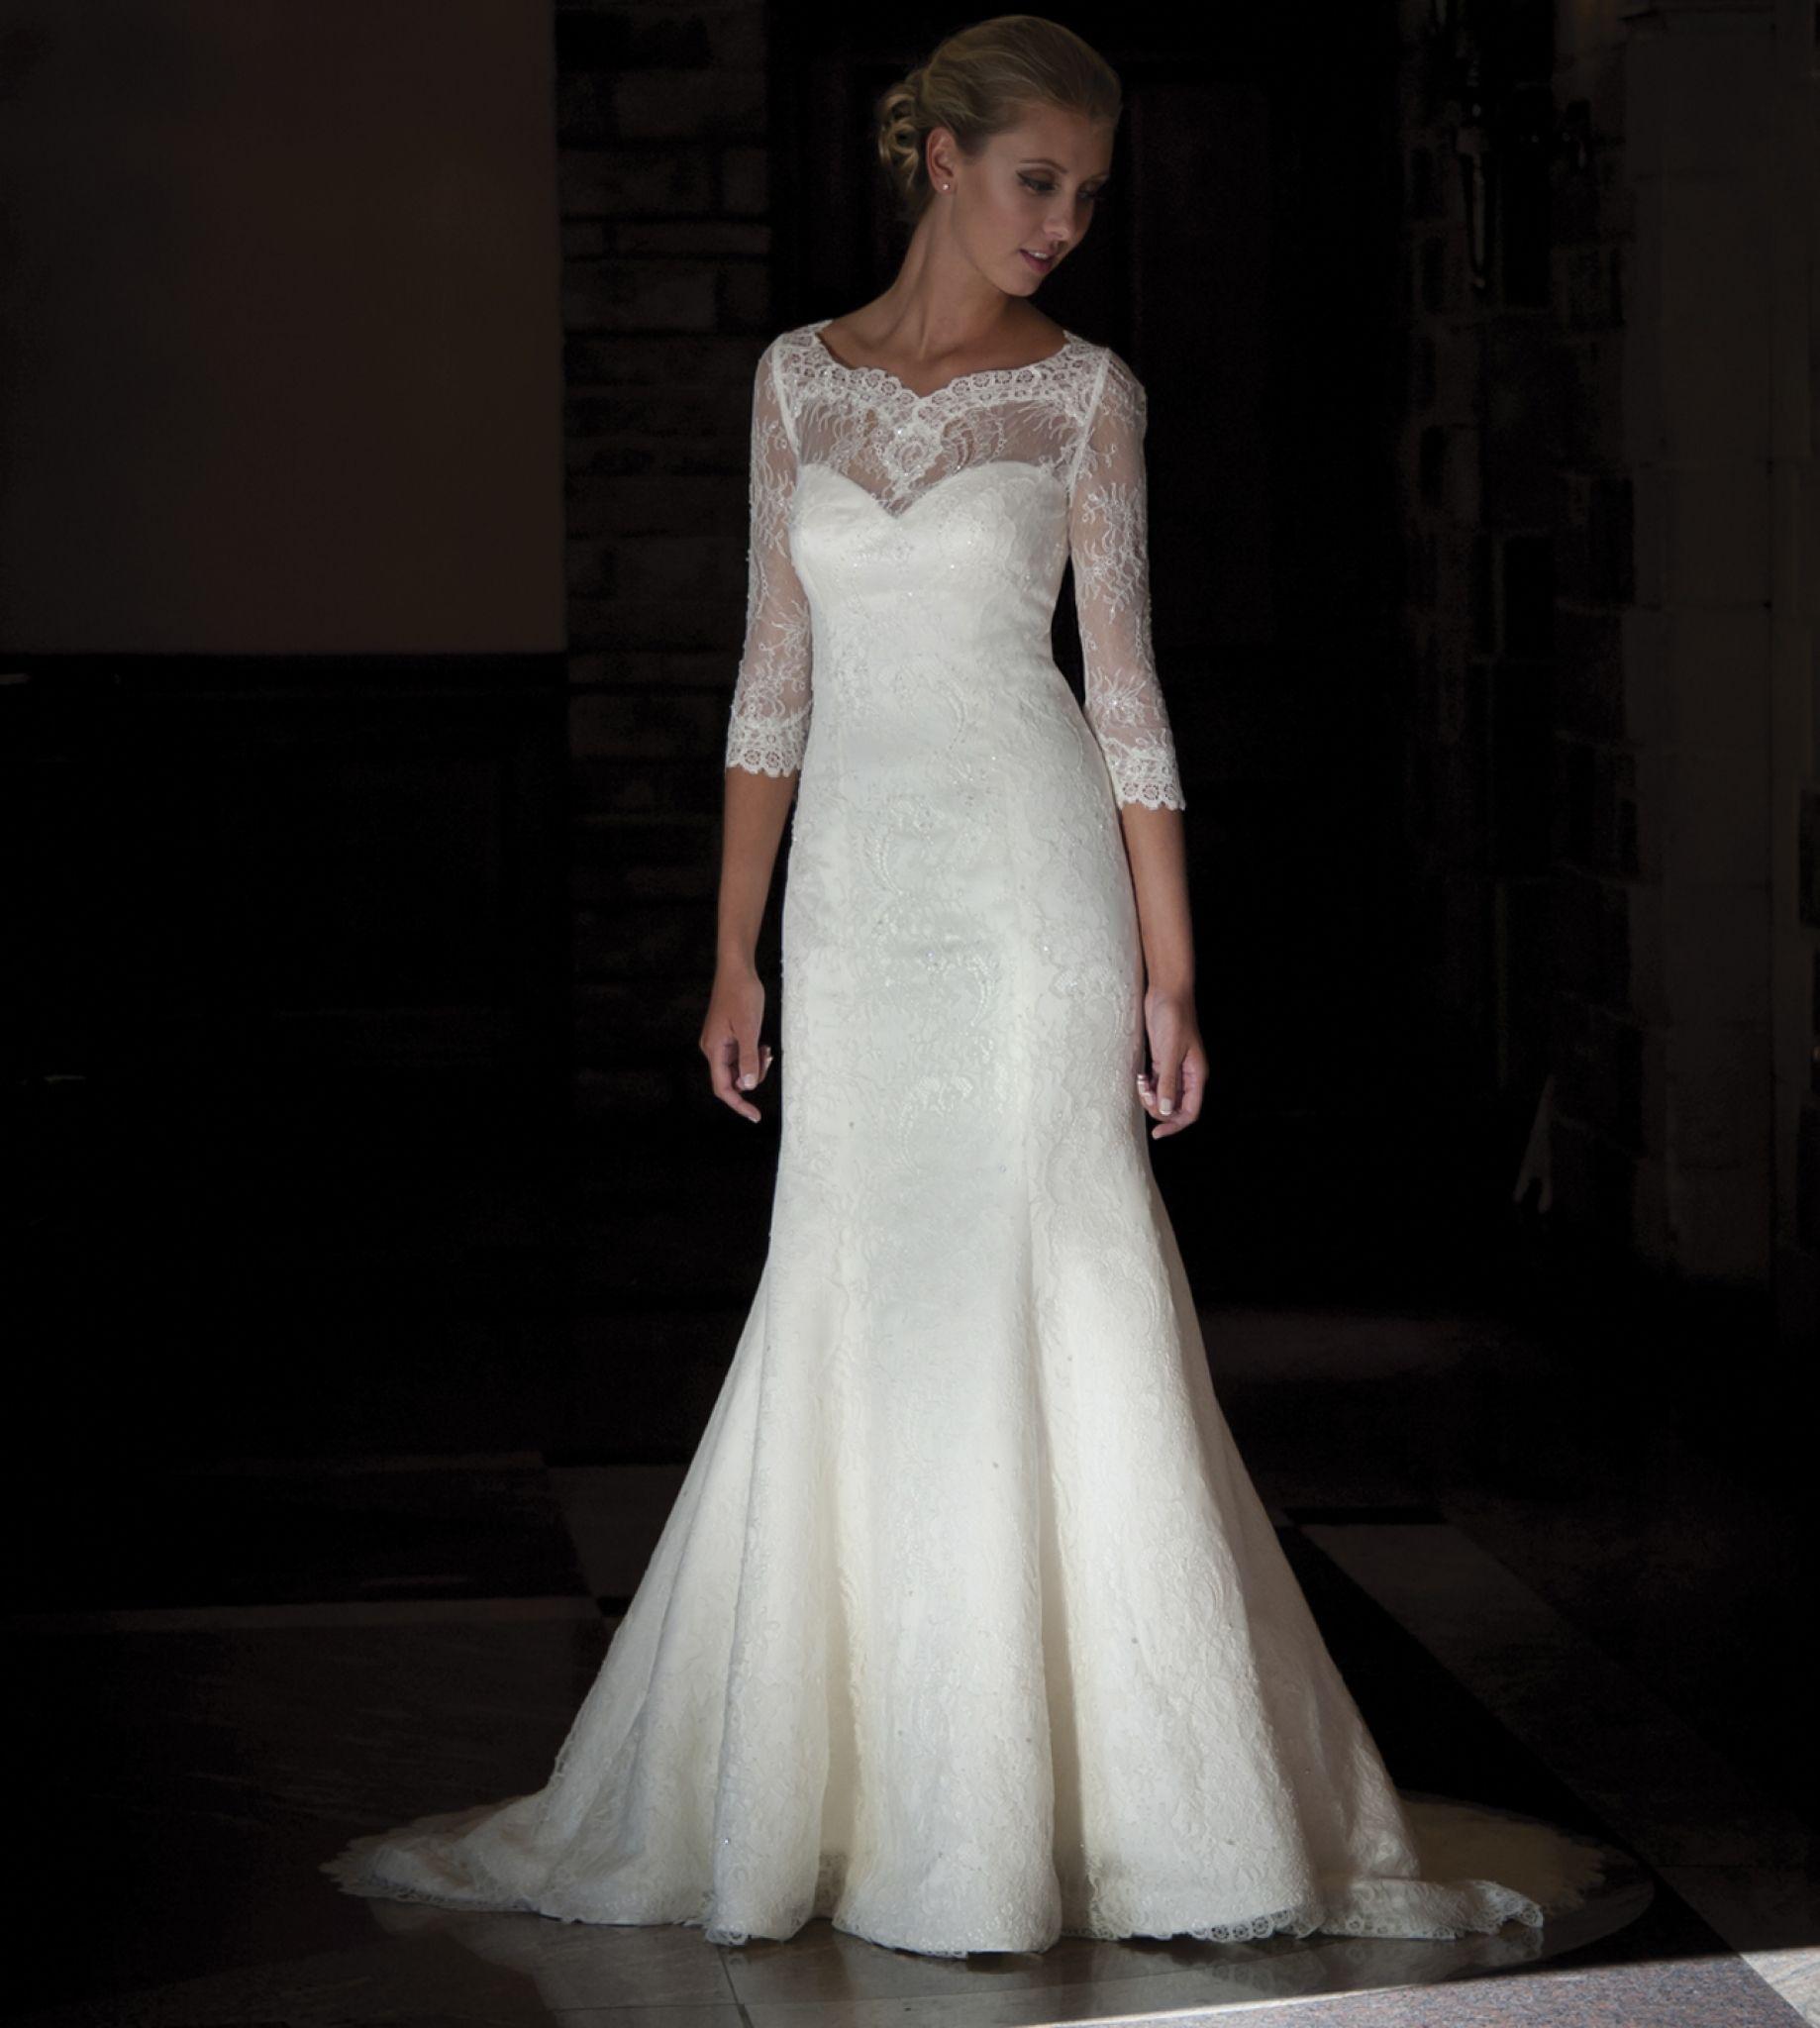 augusta jones wedding dresses - dresses for guest at wedding Check ...